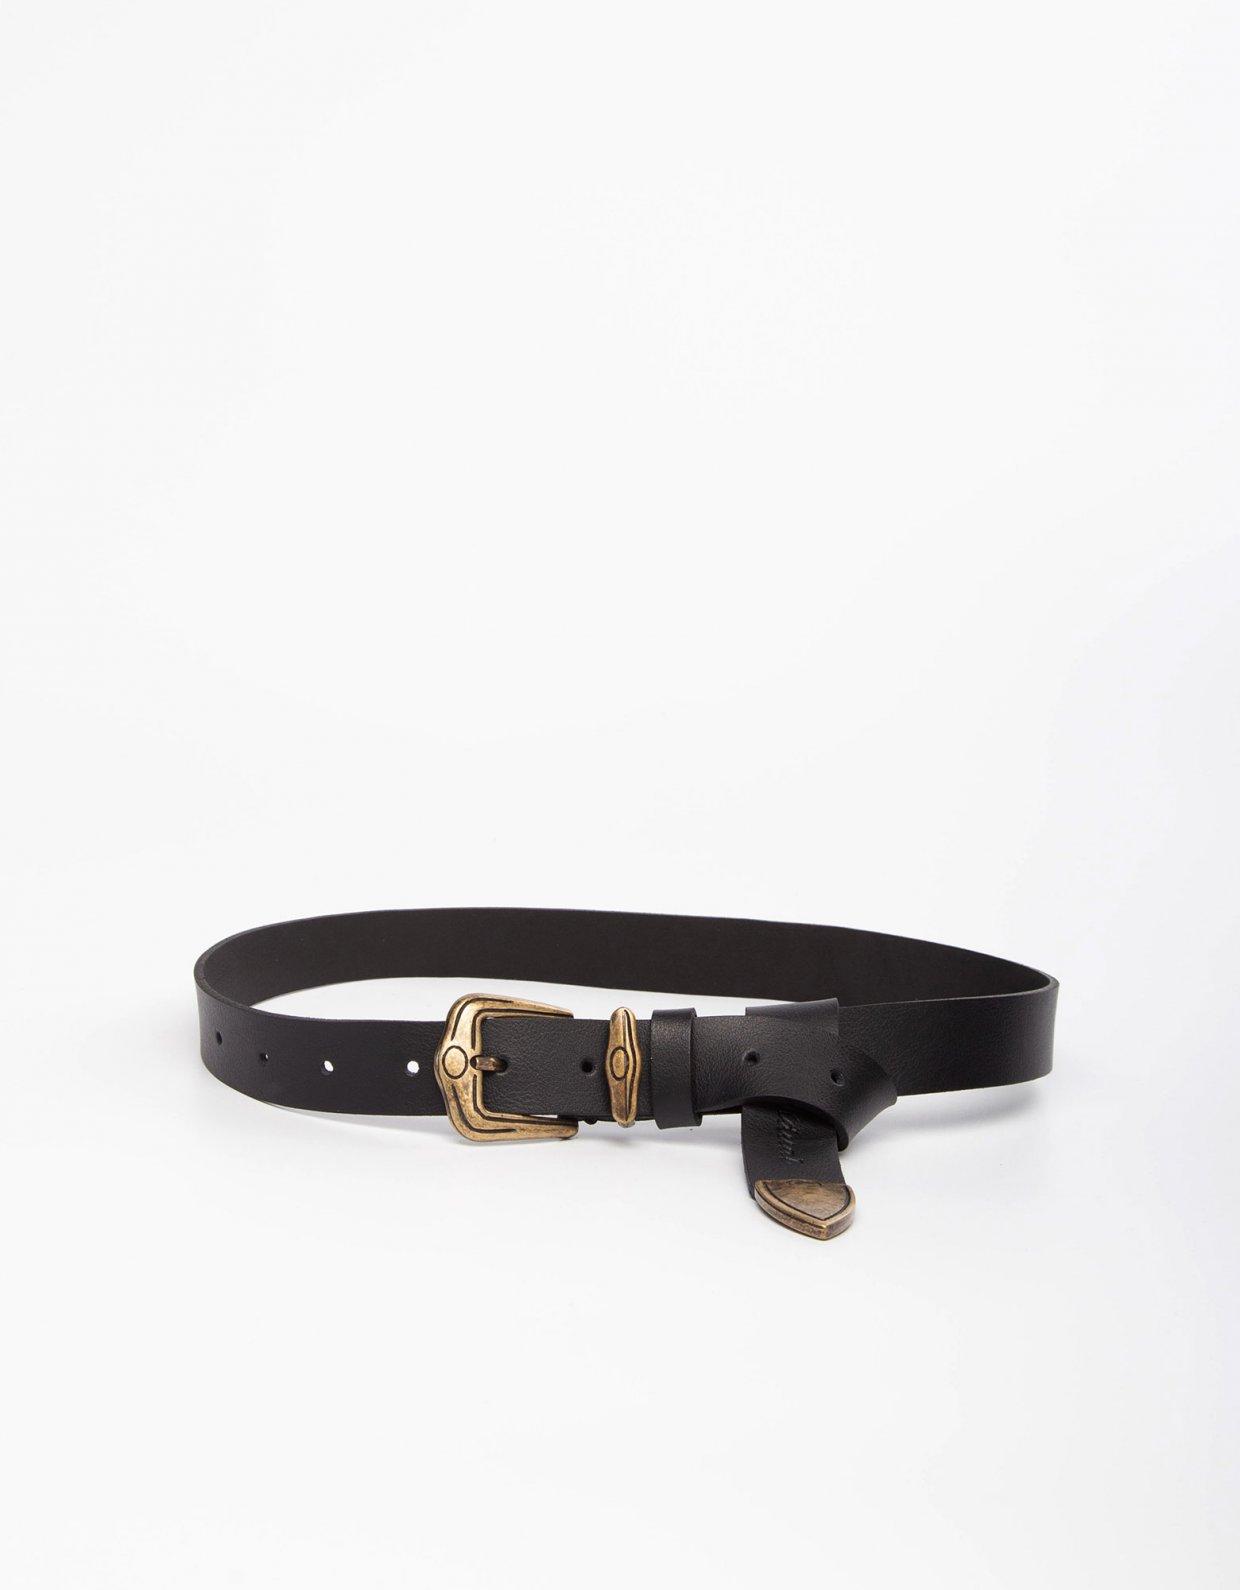 Individual Art Leather Feeling good black/bronze belt